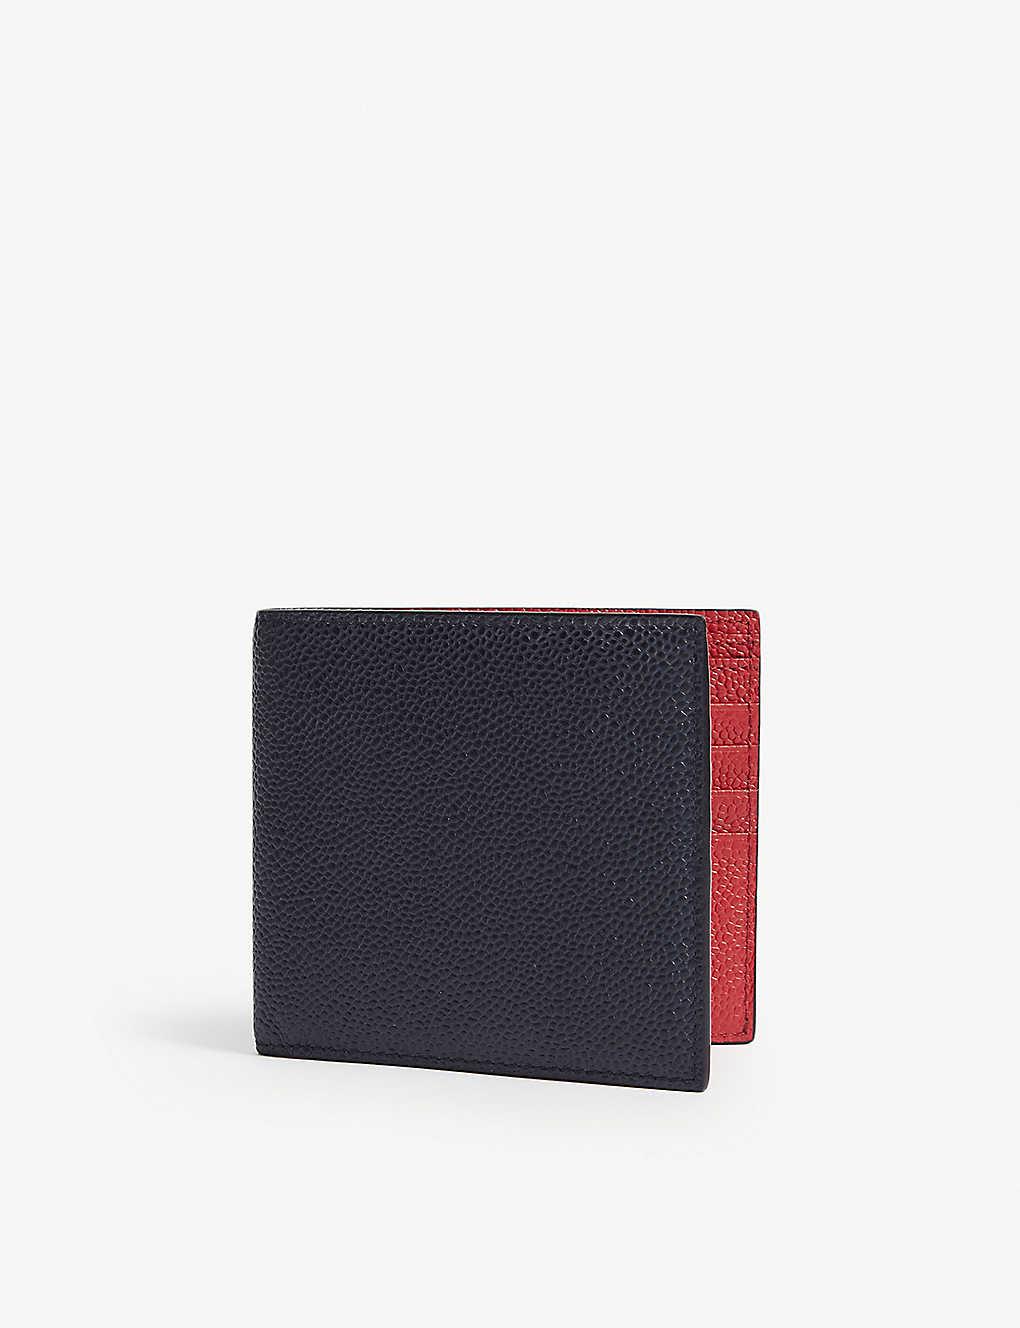 fd7f46c4195 THOM BROWNE - Pebbled leather billfold wallet | Selfridges.com